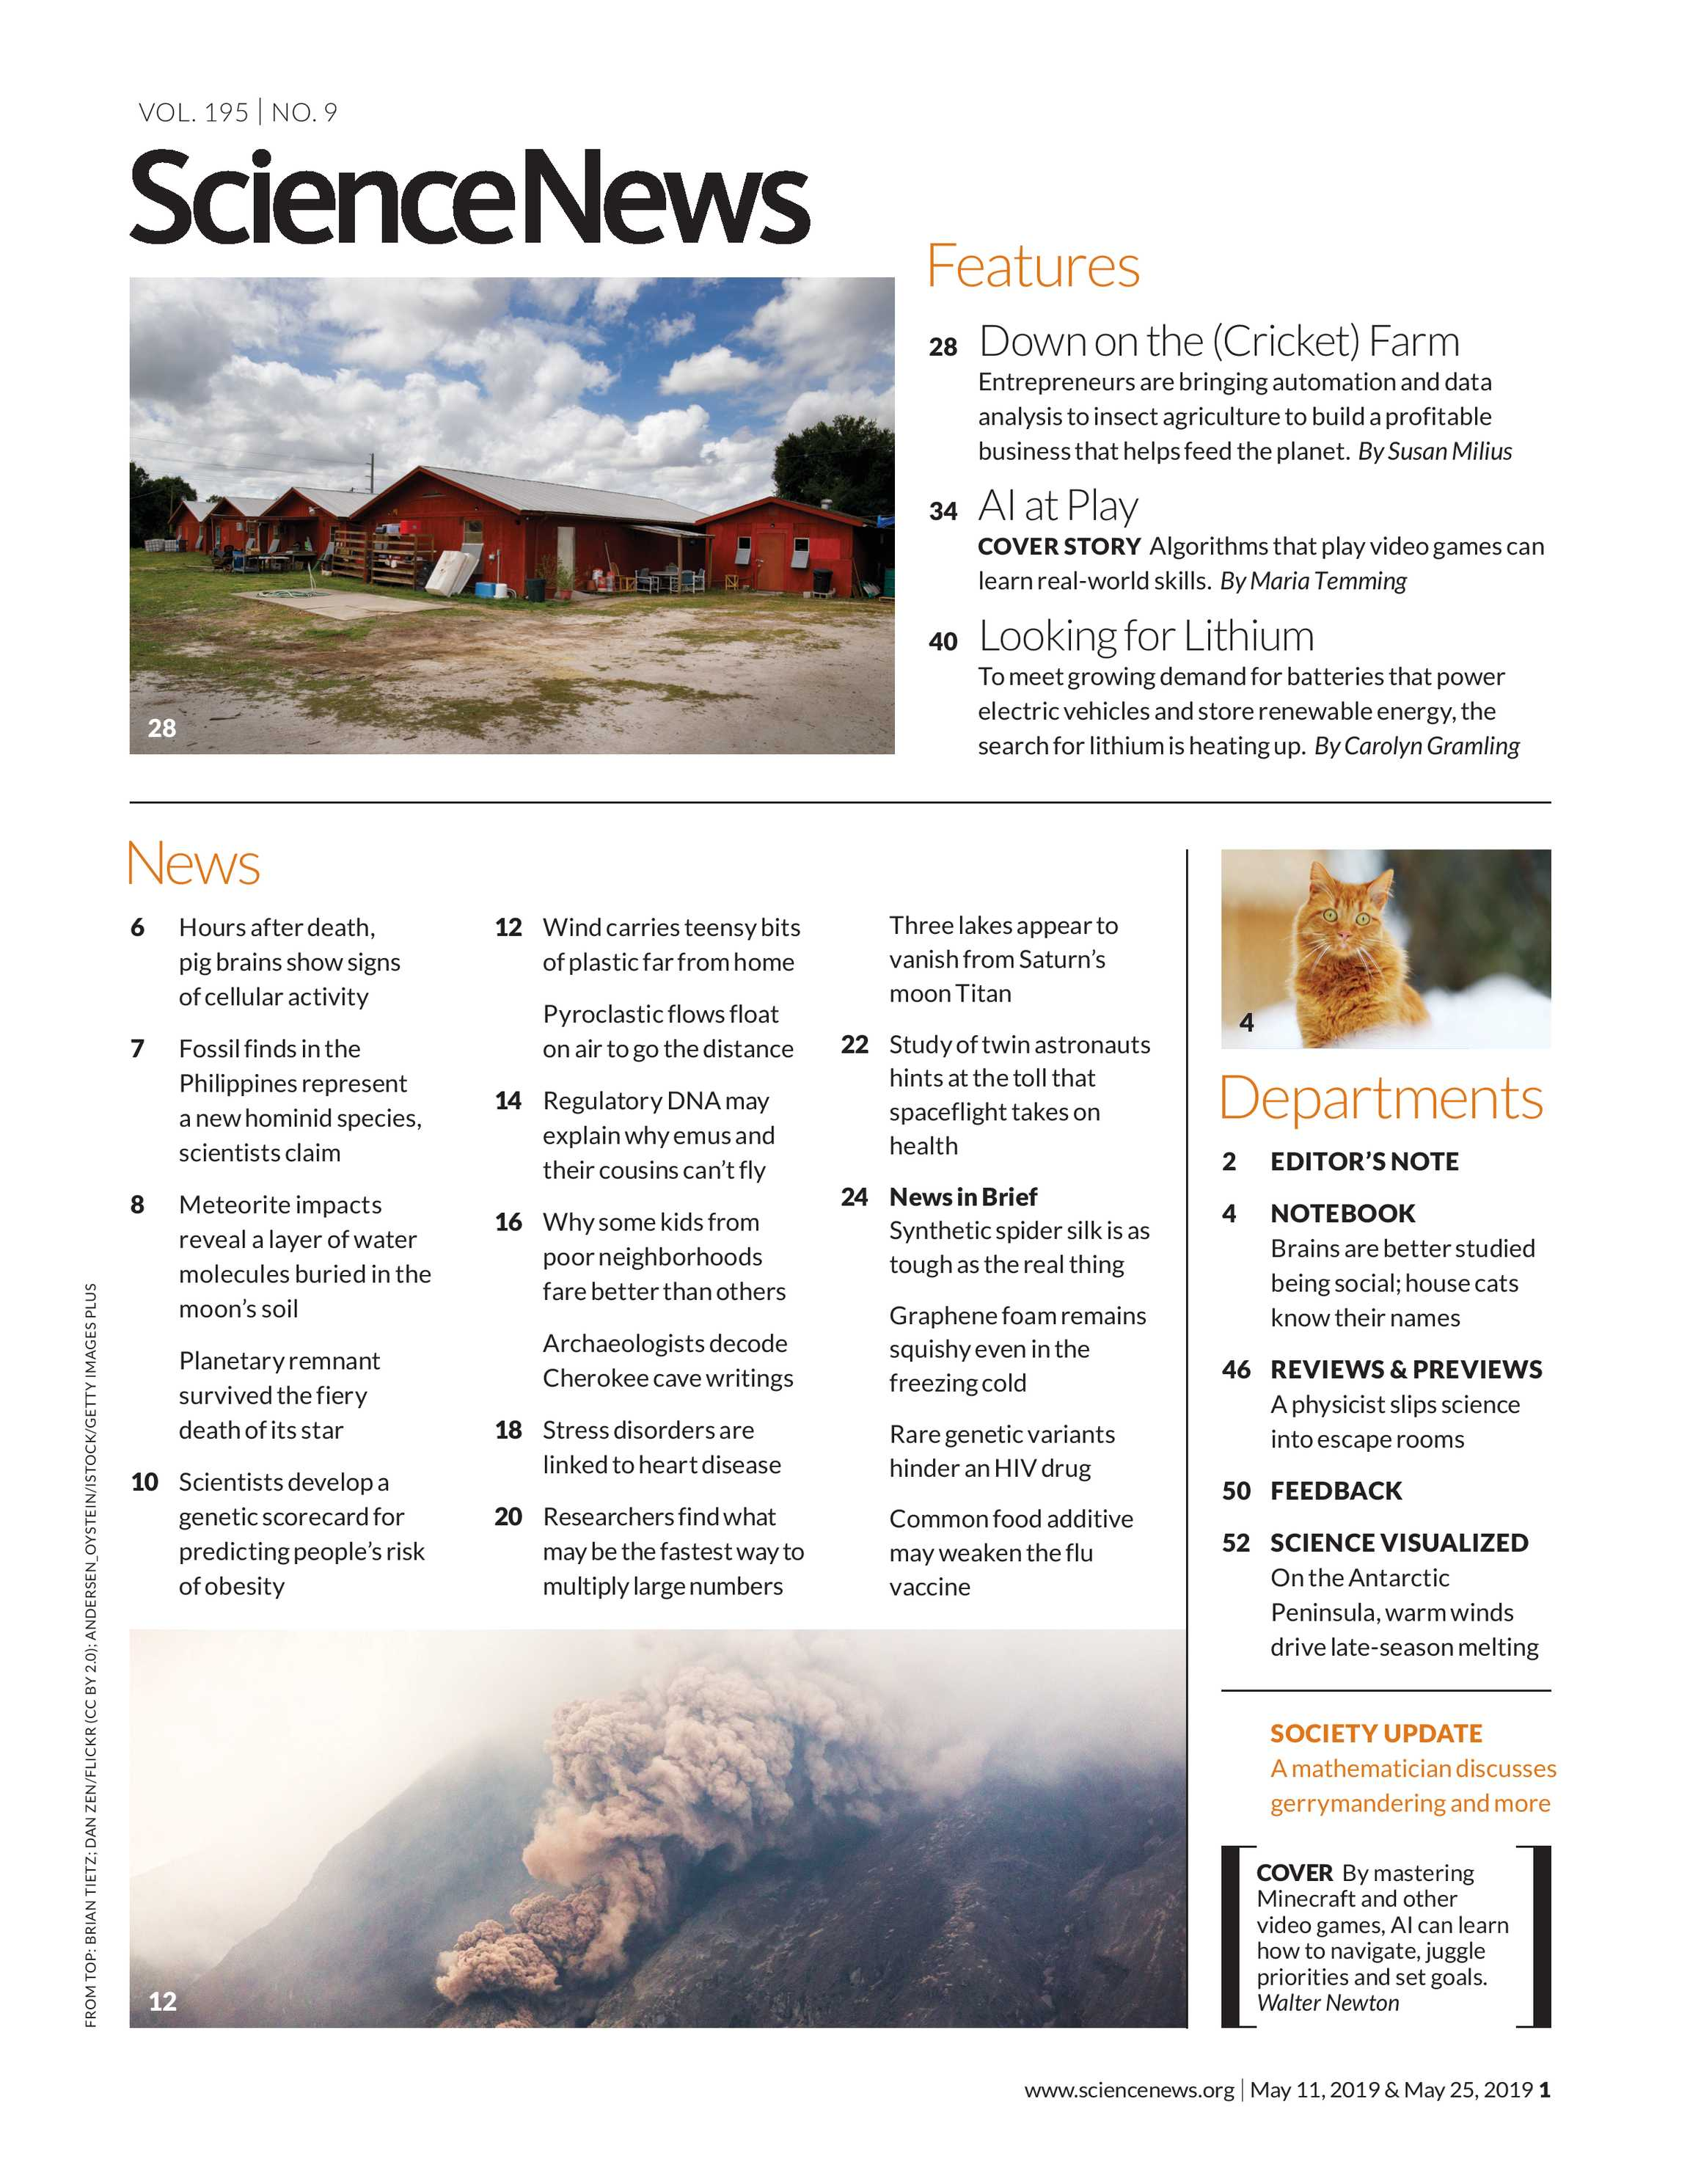 Science News - May 11, 2019 and May 25, 2019 - page 1